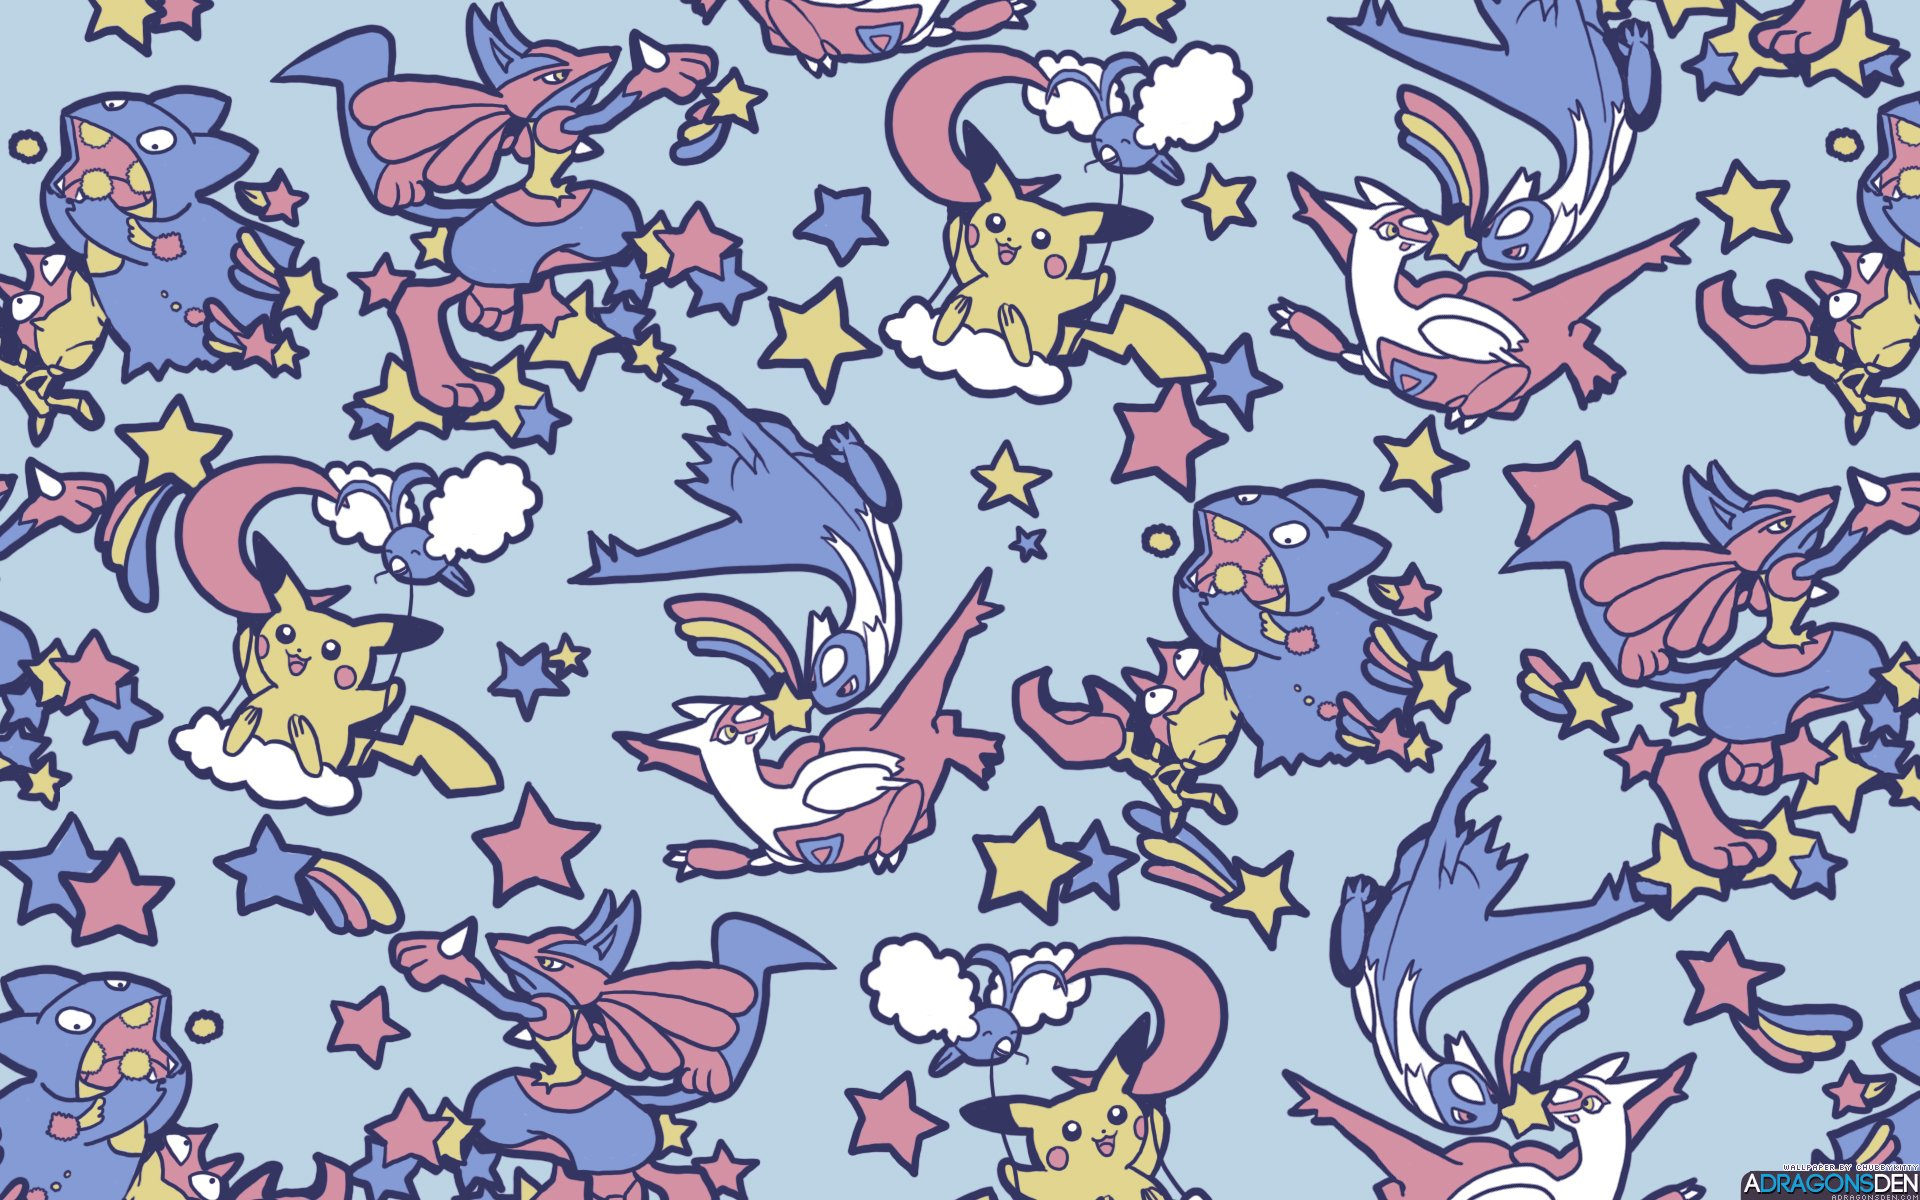 Mudkip Iphone Wallpaper Pokemon And Stars Hd Wallpaper Background Image